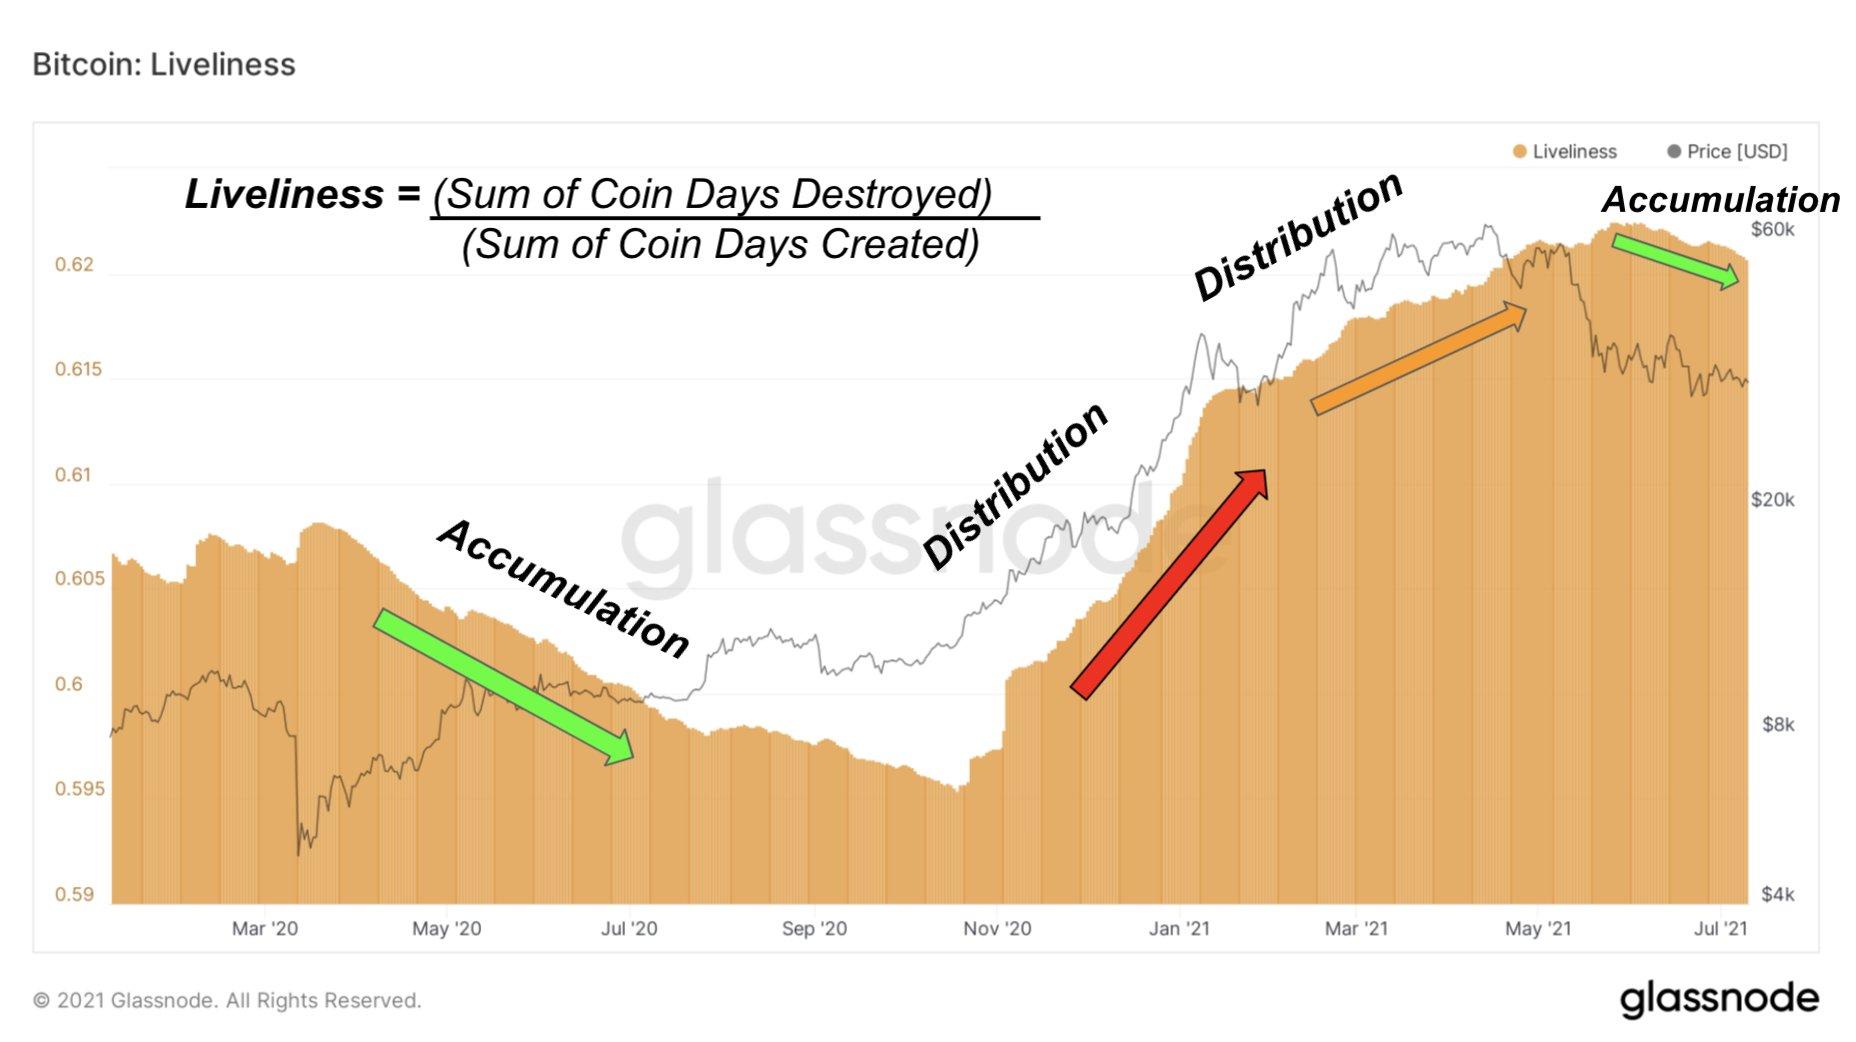 biểu đồ nắm giữ bitcoin glassnode